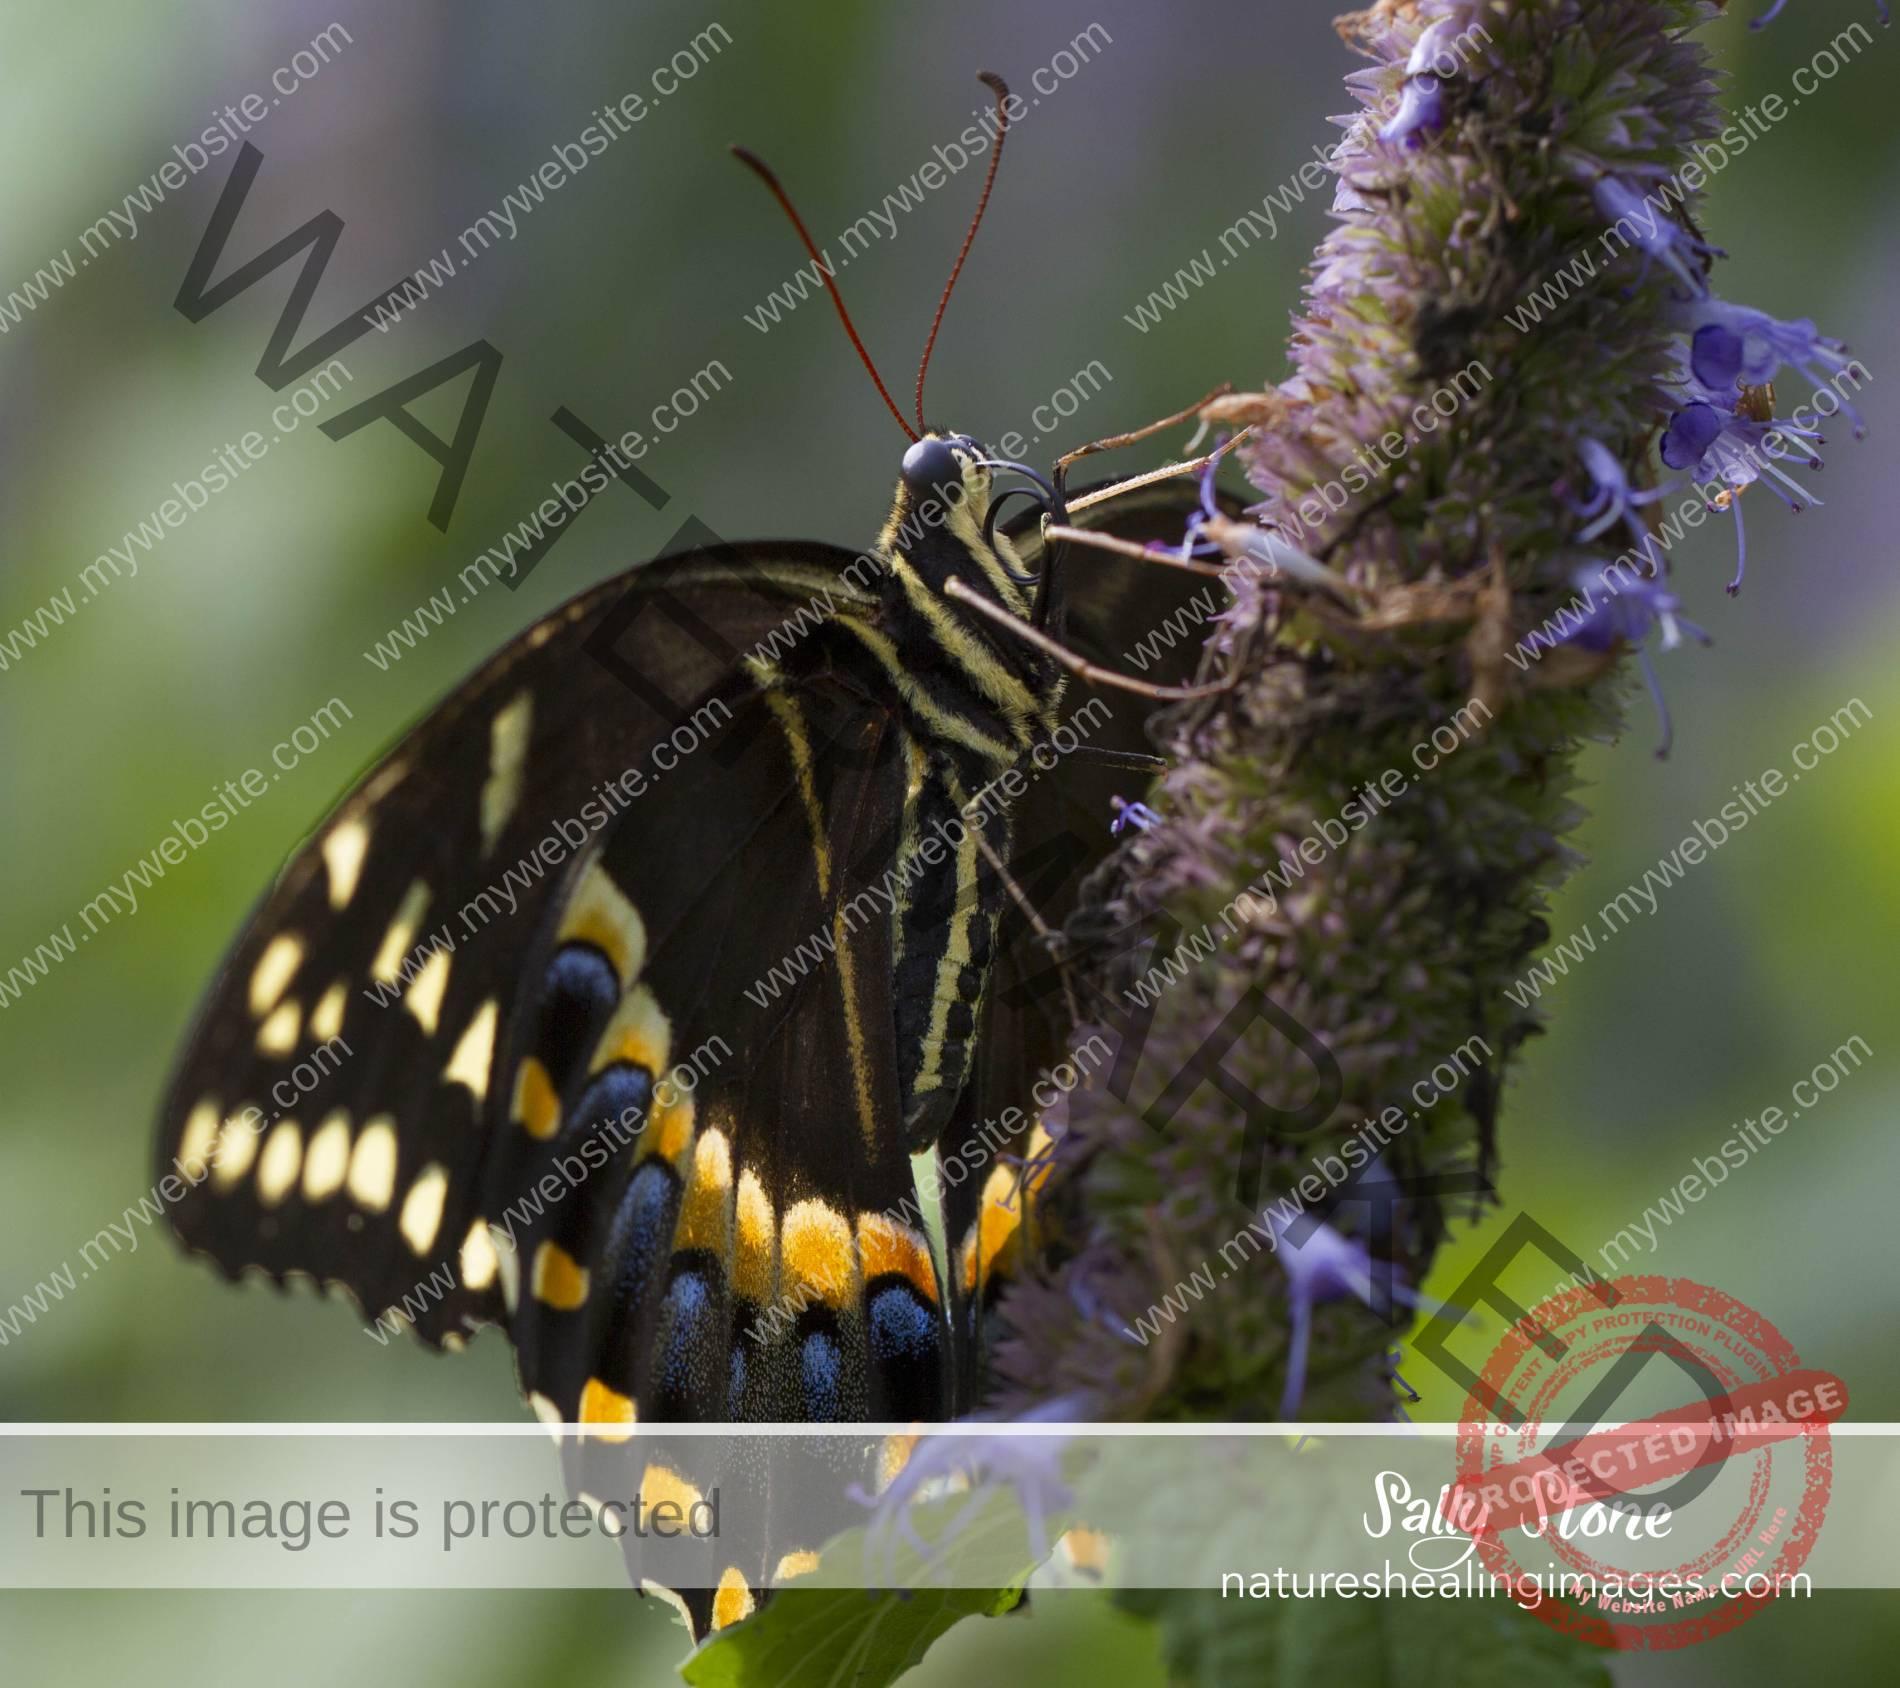 Spicetail Swallowtail